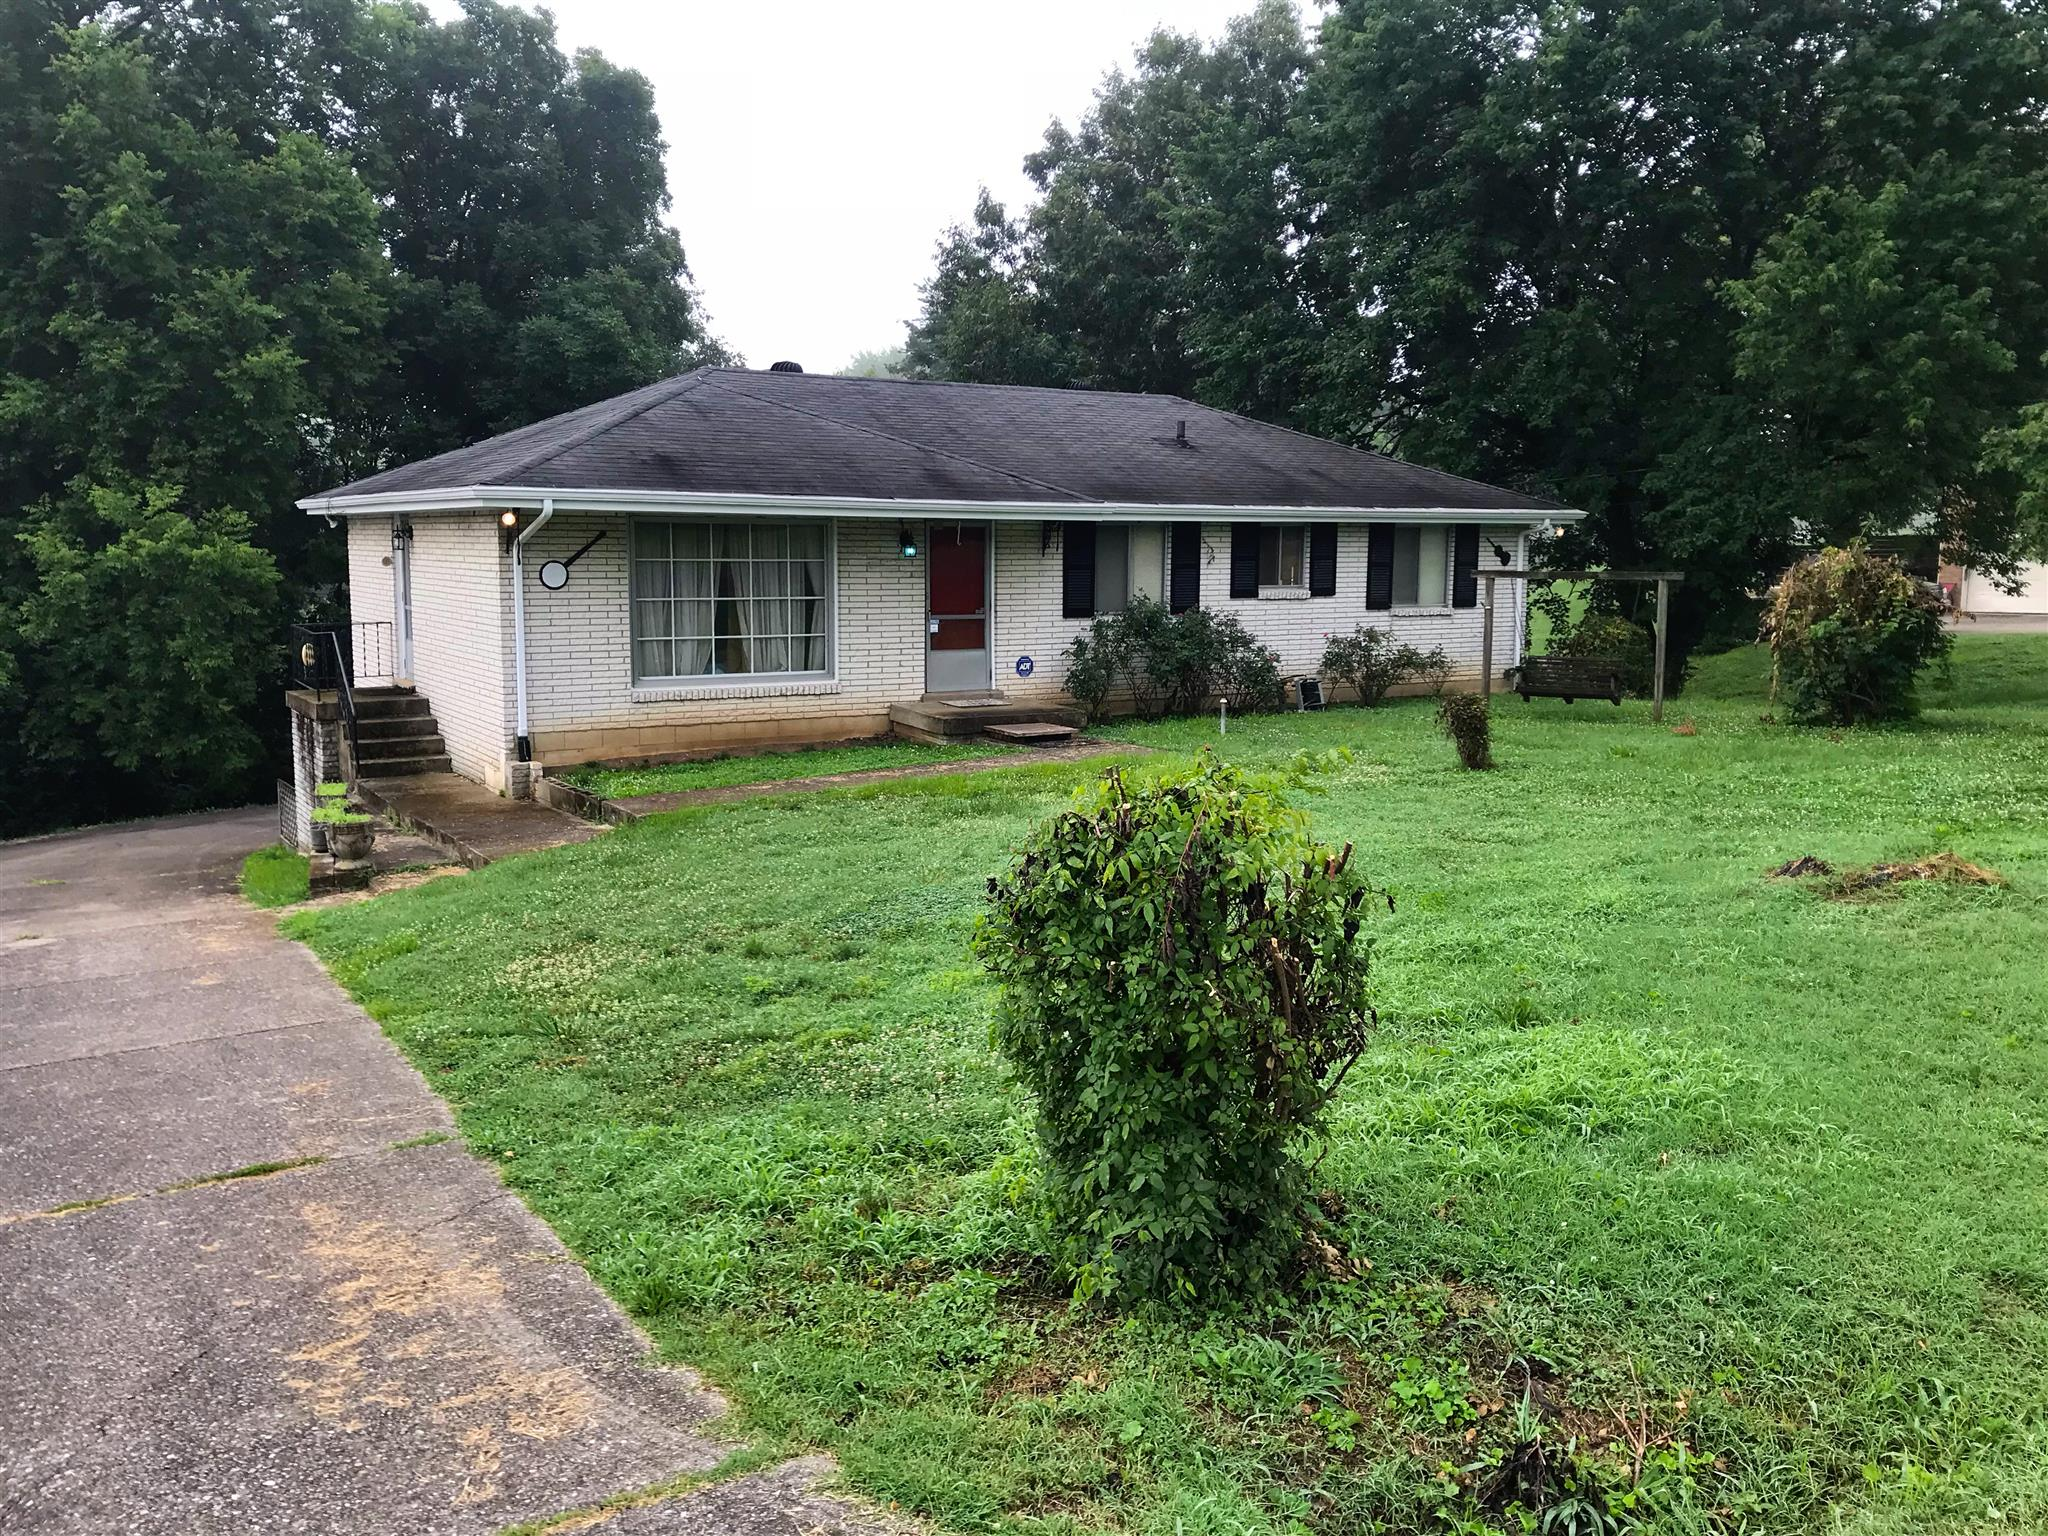 414 Alta Loma Rd, Goodlettsville, TN 37072 - Goodlettsville, TN real estate listing